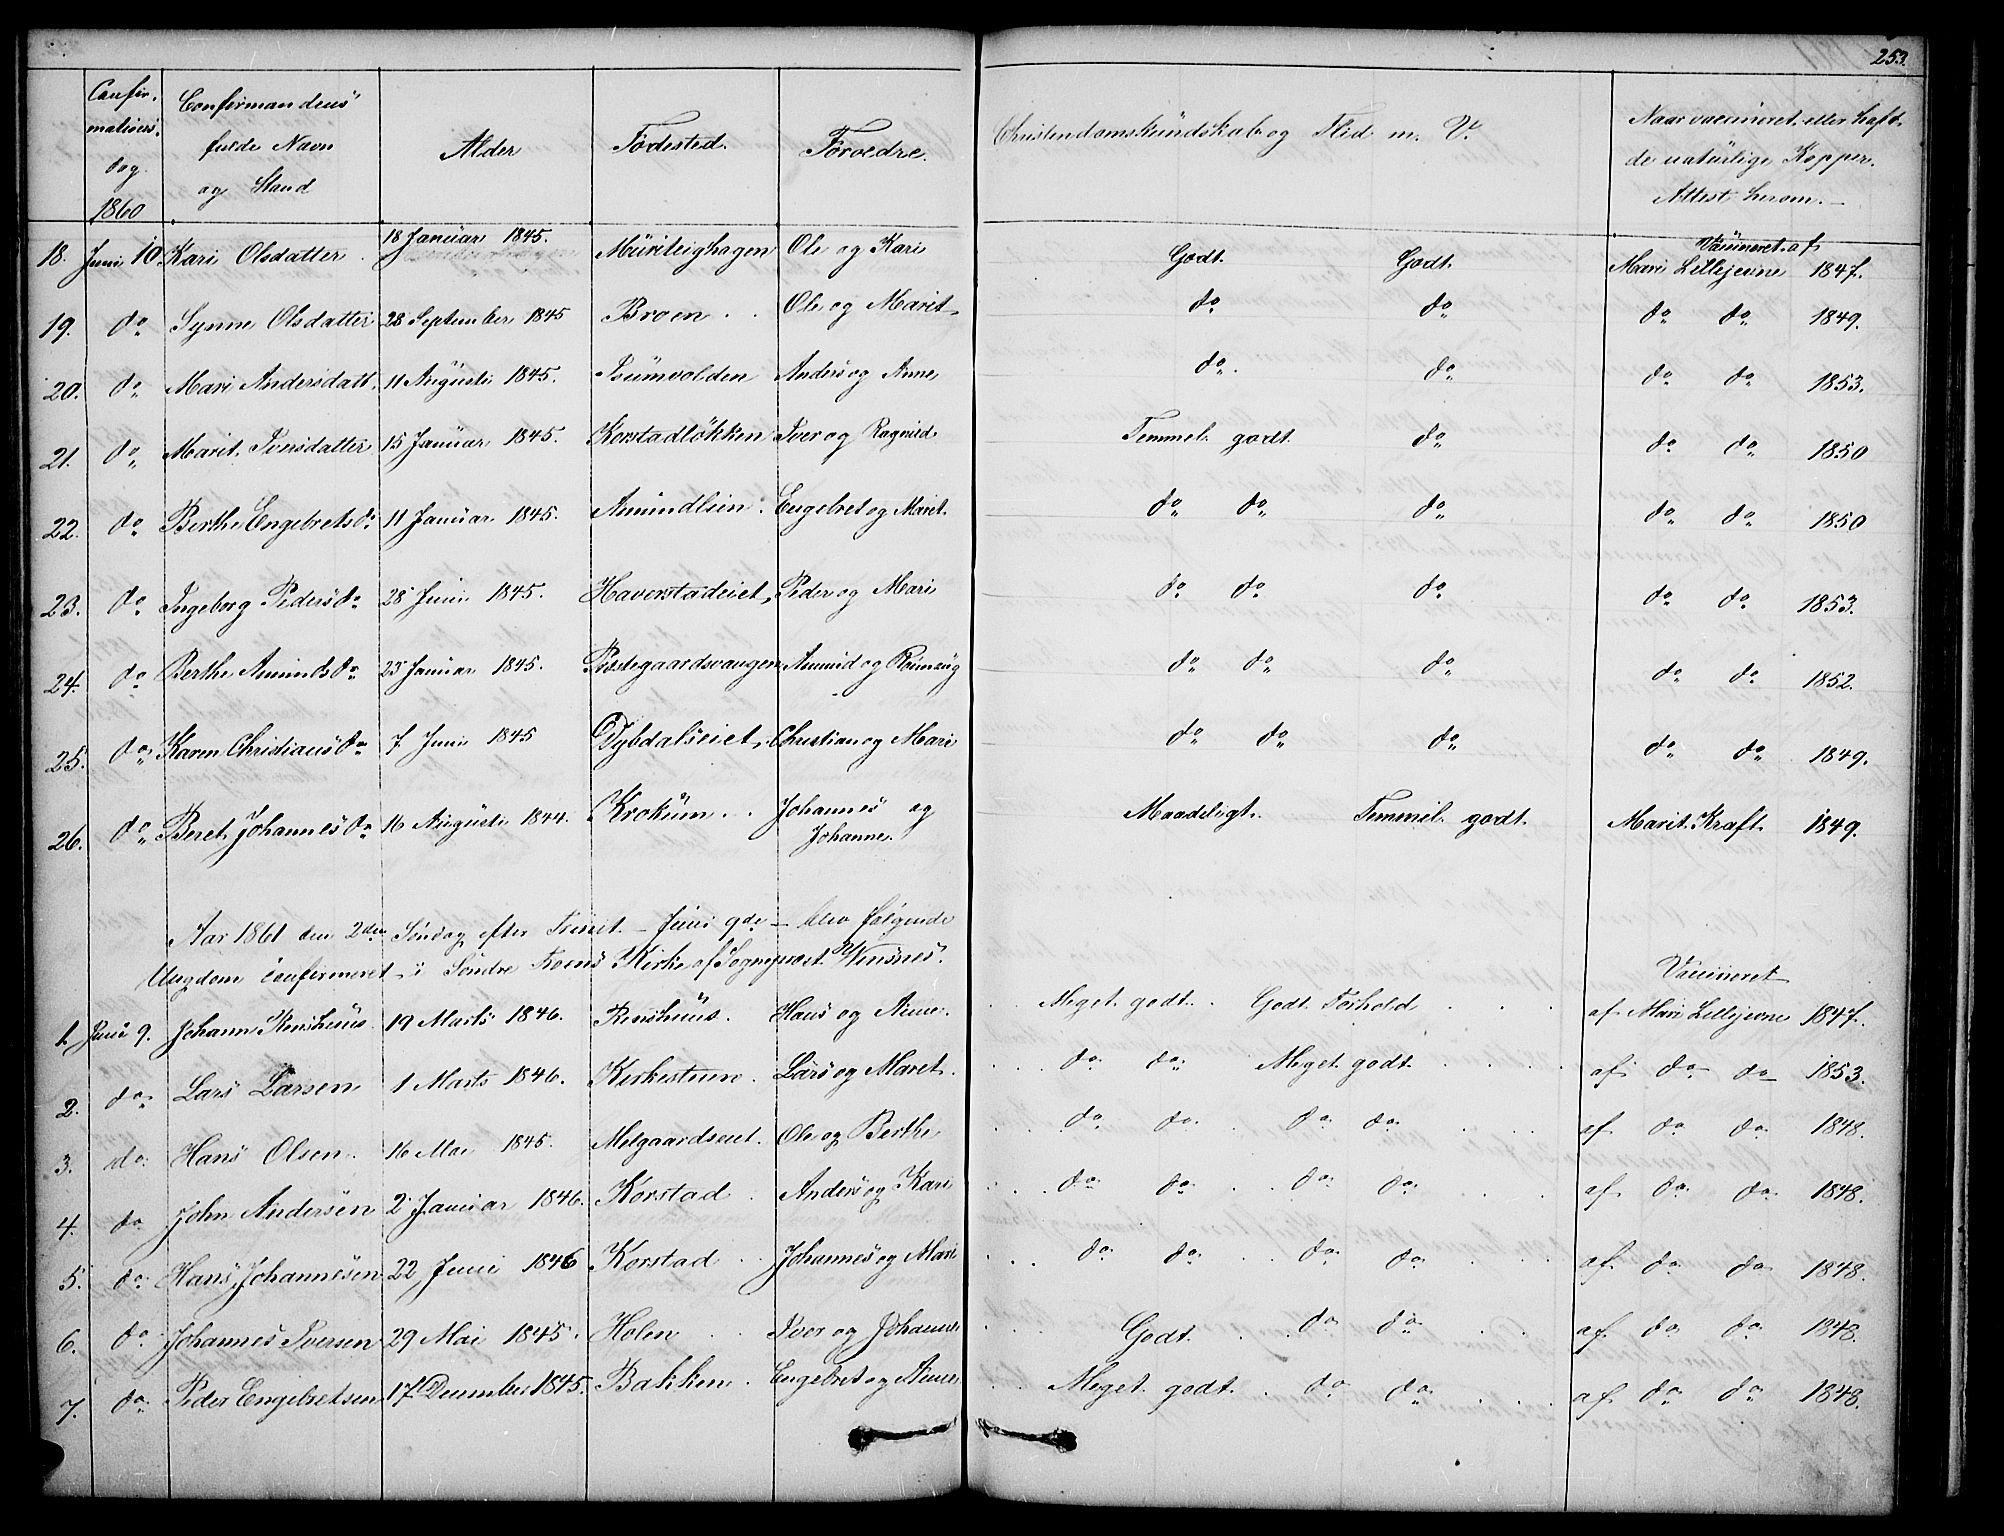 SAH, Sør-Fron prestekontor, H/Ha/Hab/L0001: Klokkerbok nr. 1, 1844-1863, s. 253